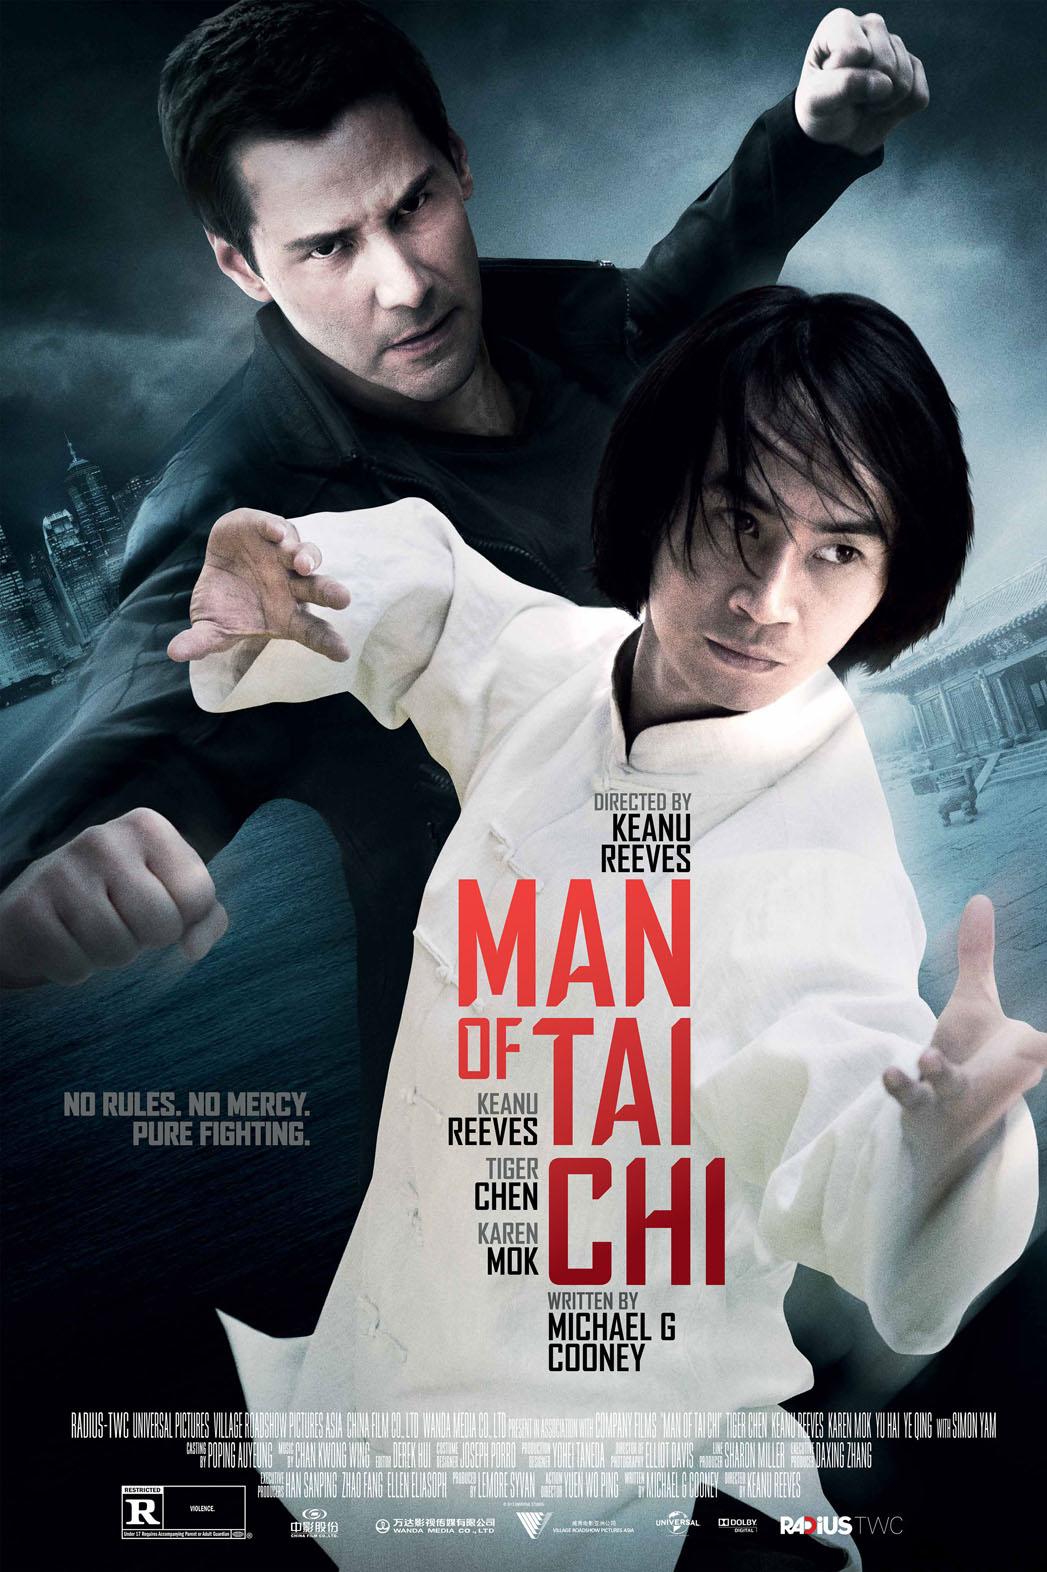 Man of Tai Chi Poster - P 2013